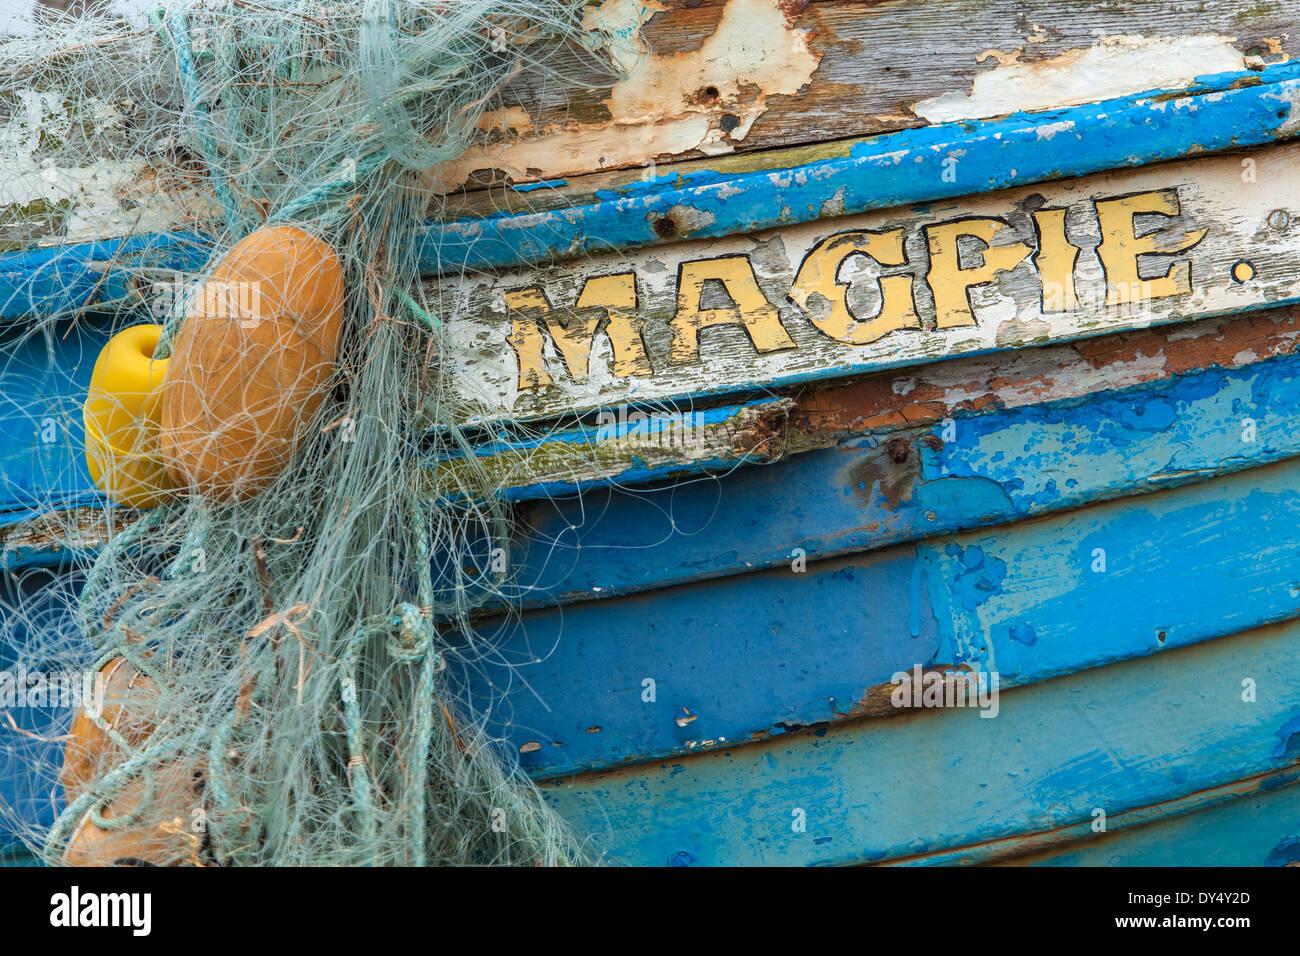 Nom bateau 'Magpie', Holy Island, Lindisfarne, Angleterre Photo Stock